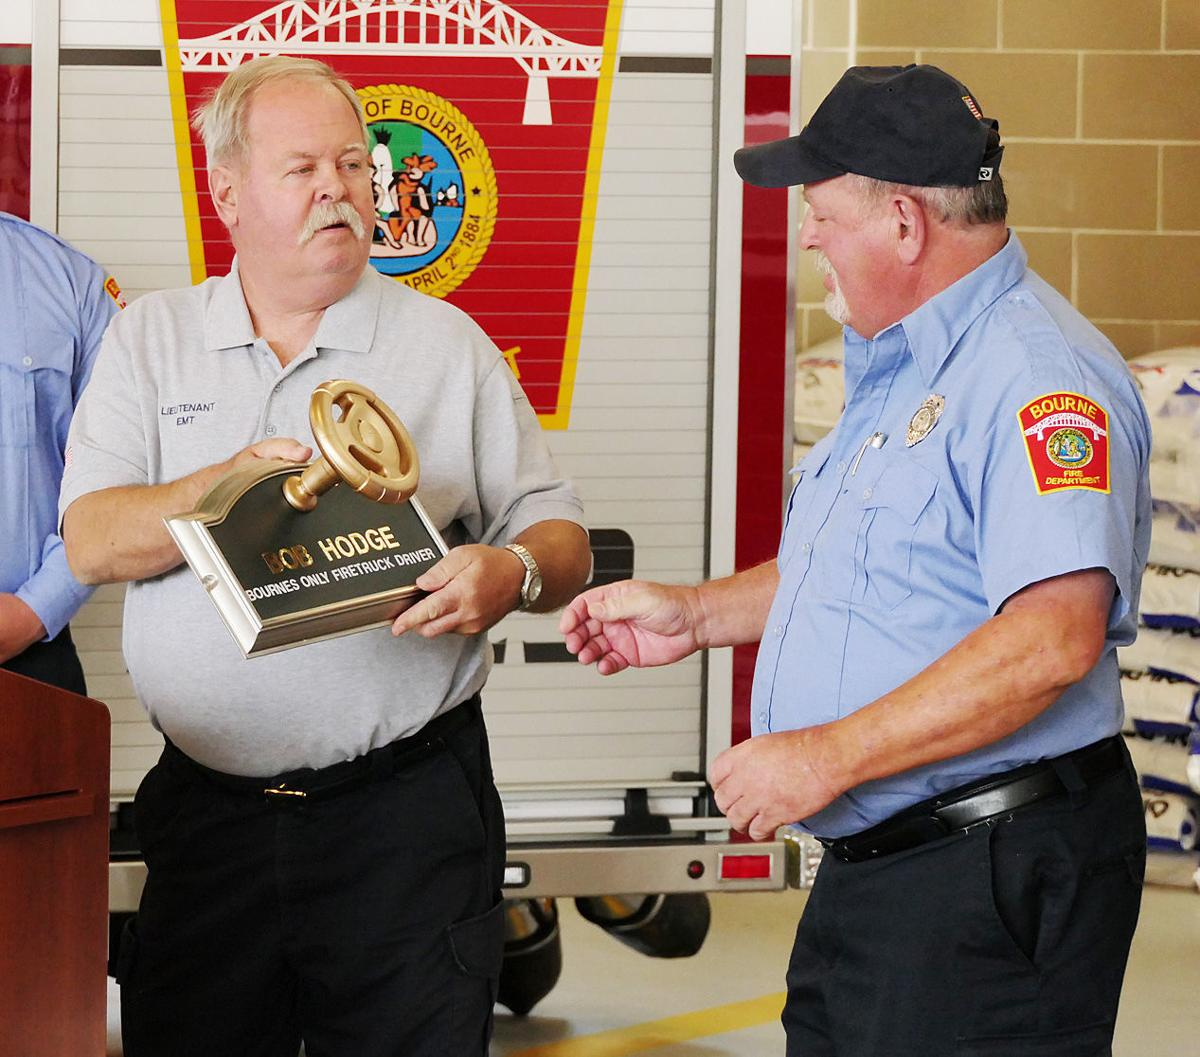 Sagamore Fire Station Ceremony